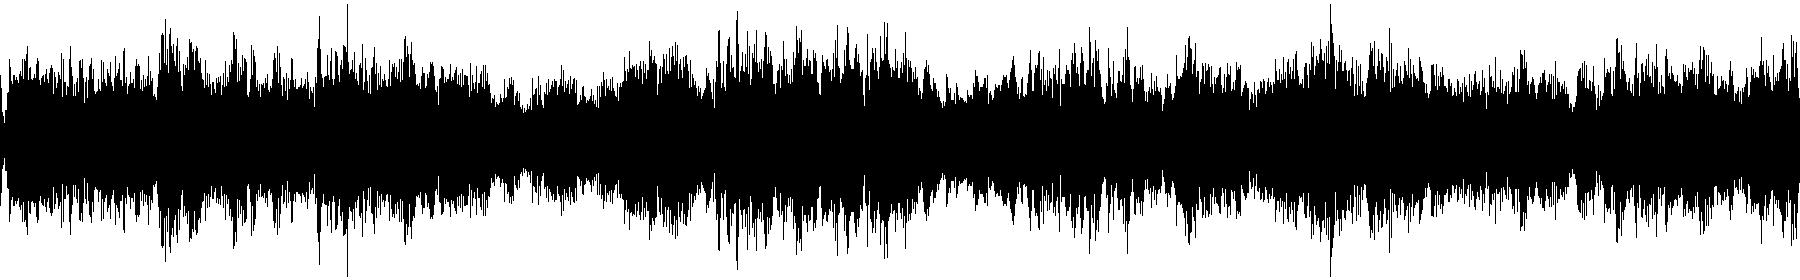 media.io time maze synth